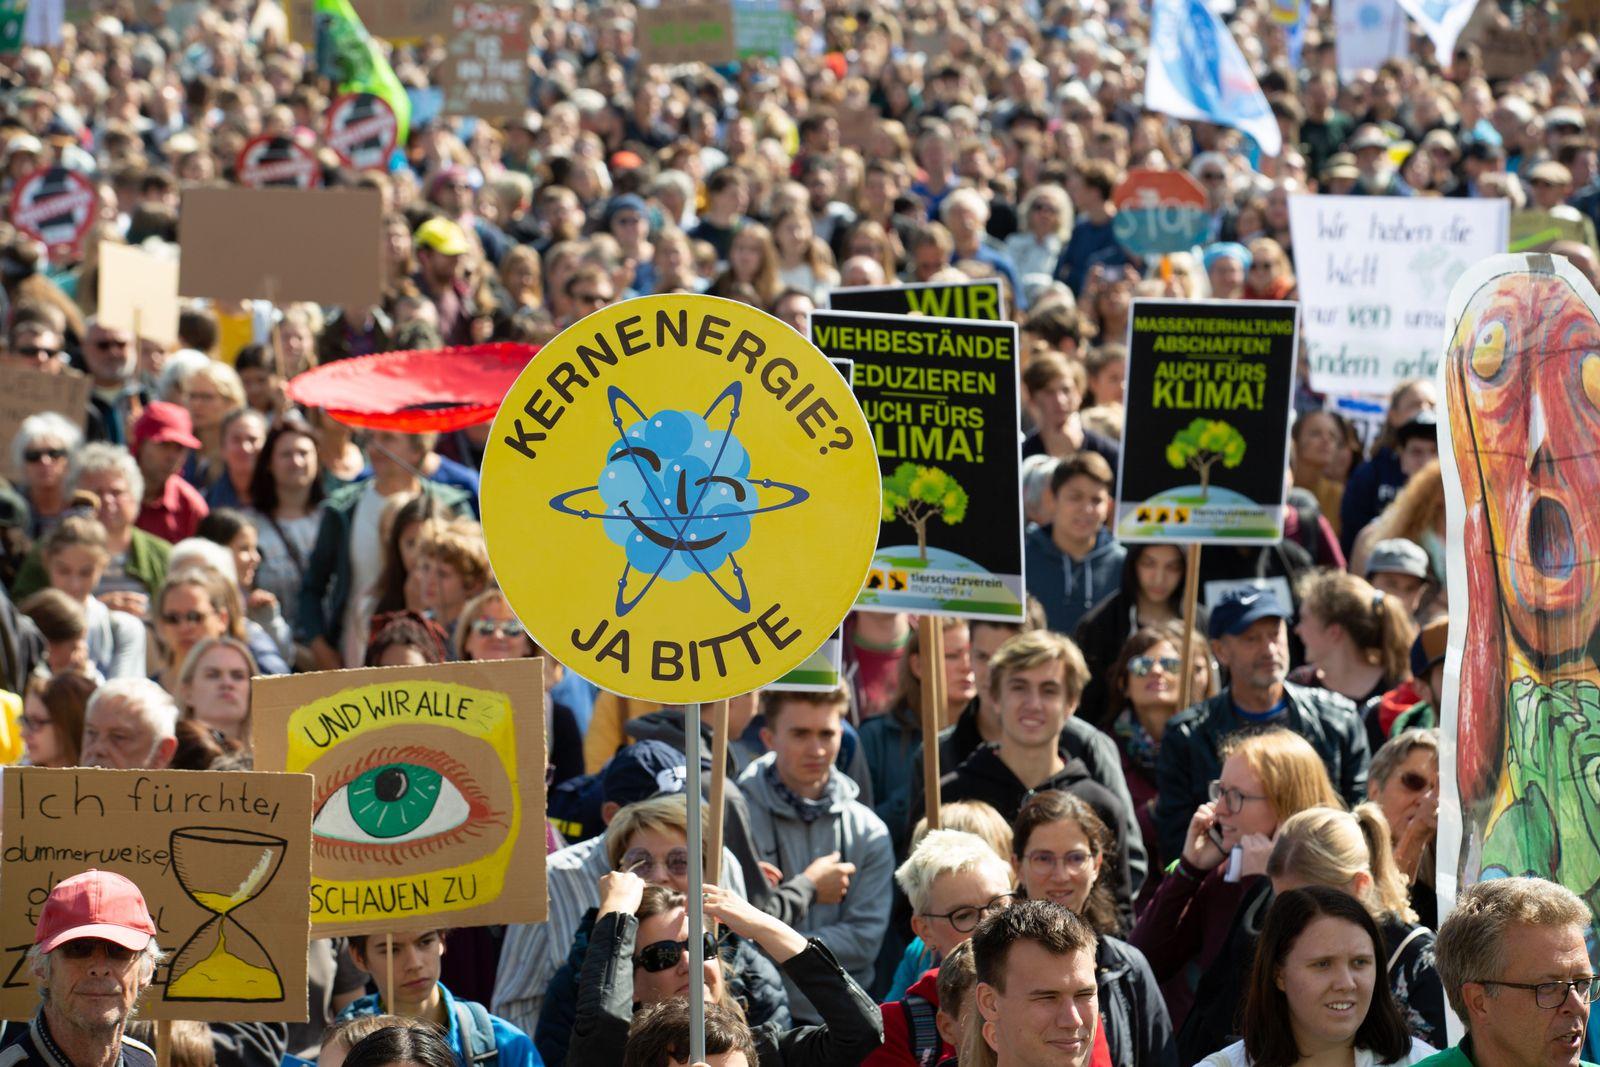 Global Climate Strike, Munich, Germany - 20 Sep 2019